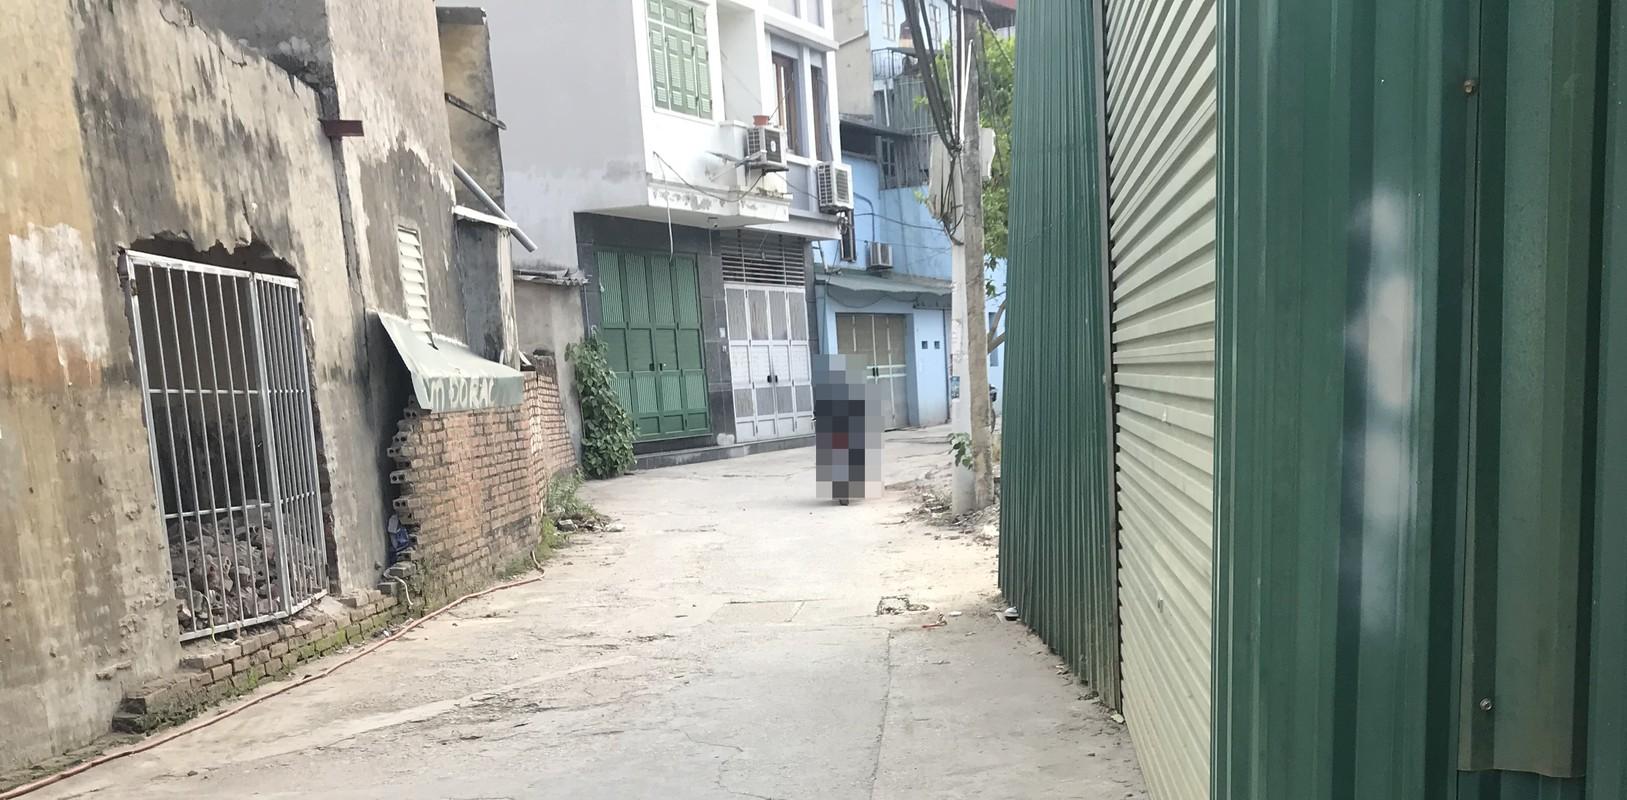 Can canh hang loat cong trinh xay dung trai phep tren dat nong nghiep o Khuong Dinh-Hinh-8